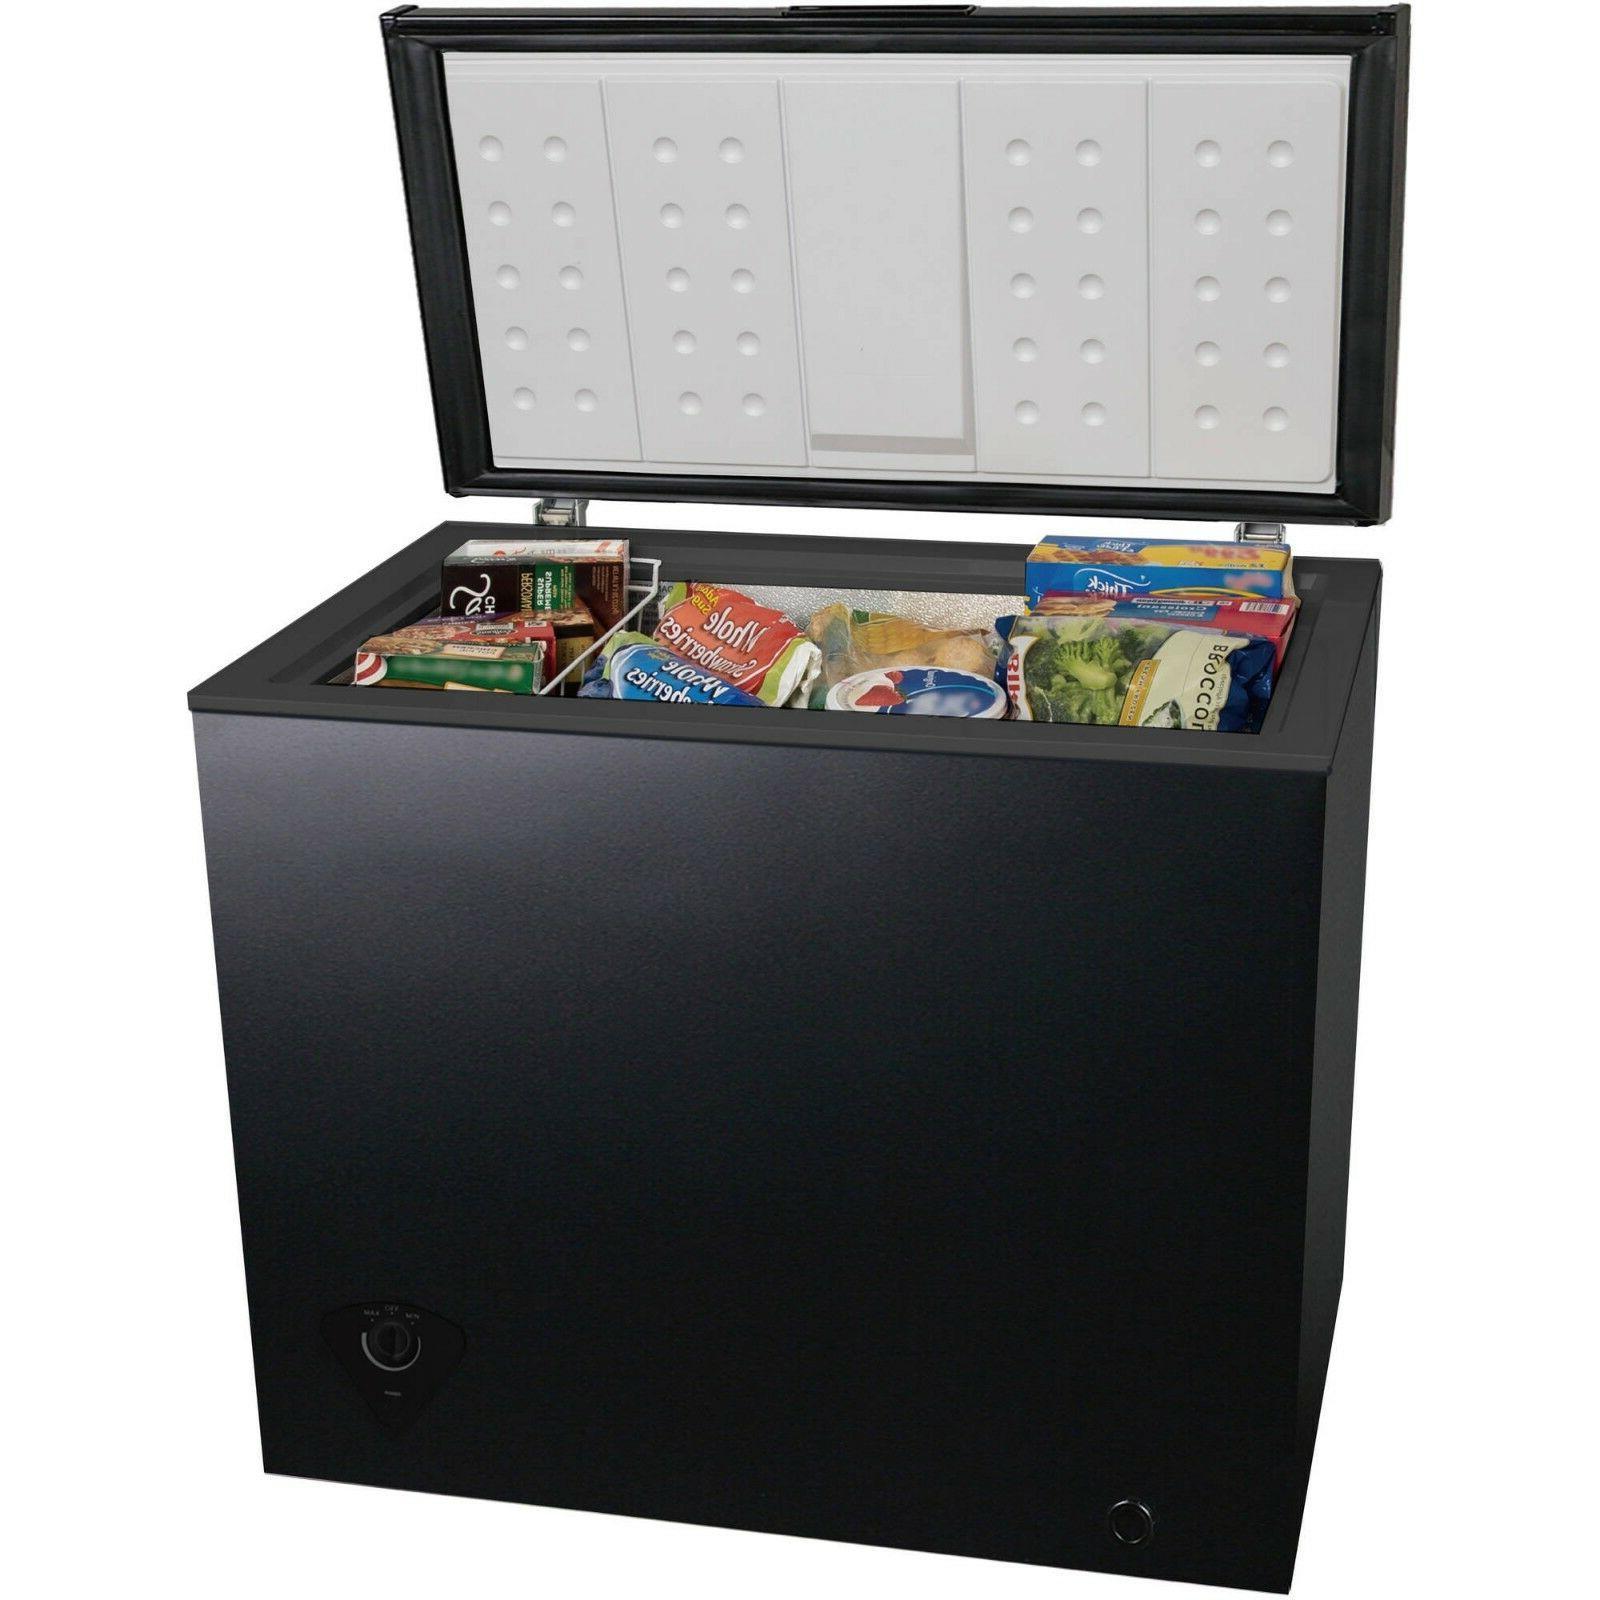 best 7 cubic foot chest freezer upright